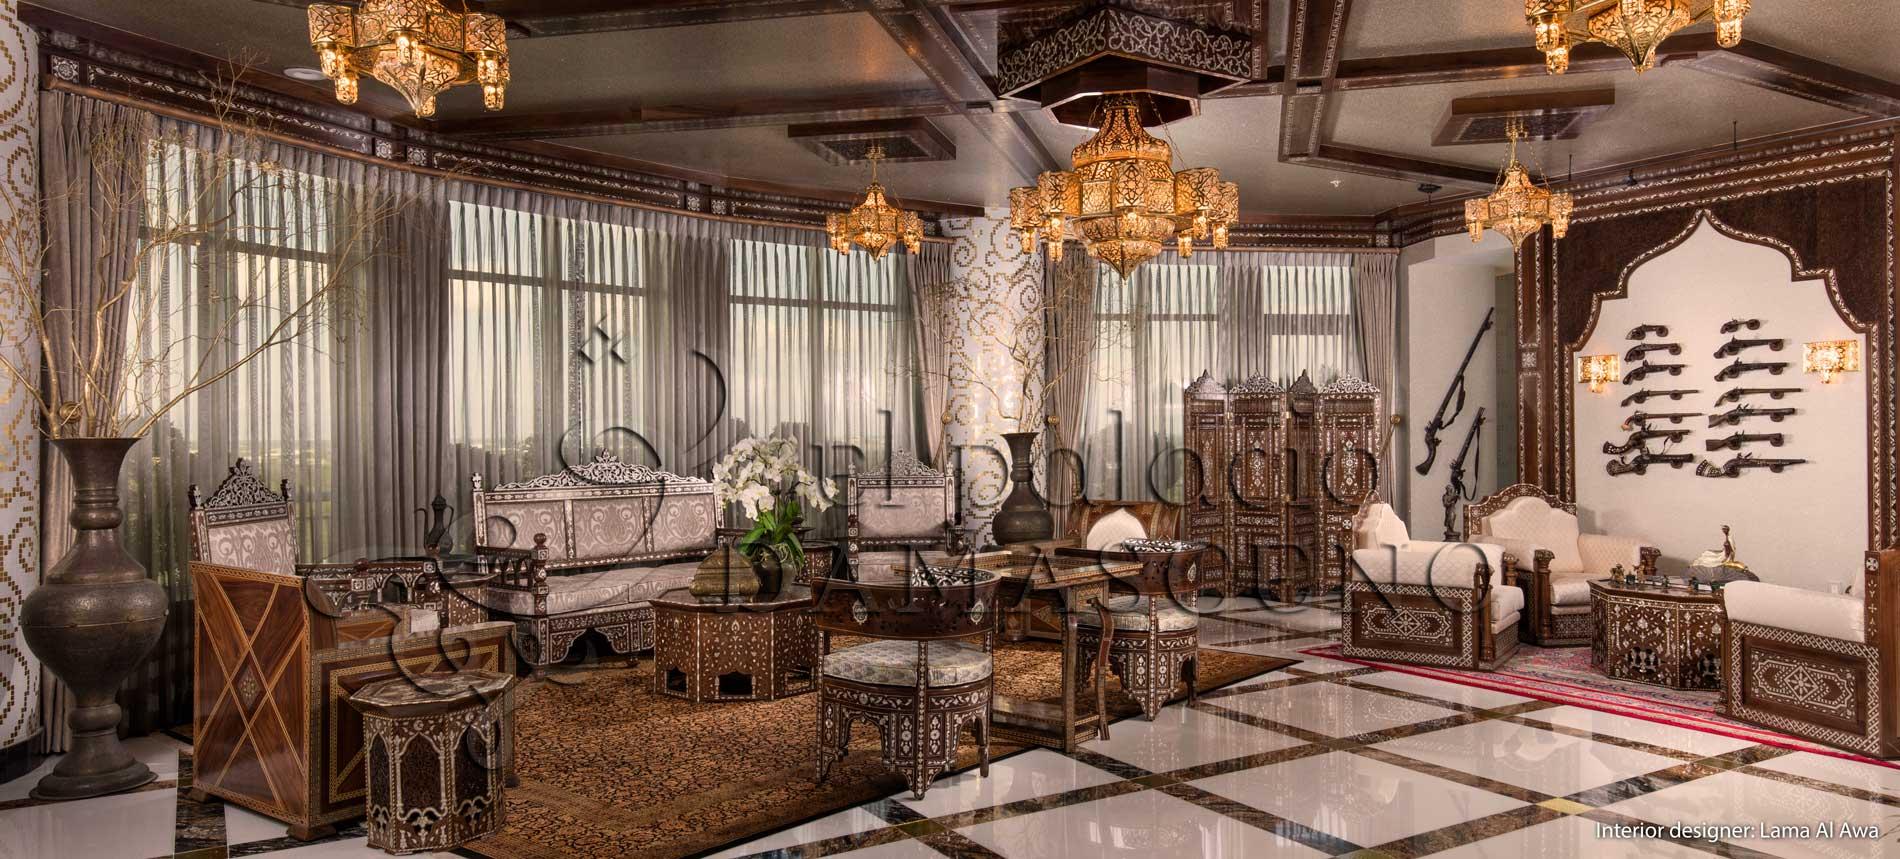 Interior Design Ideas & Inspiration